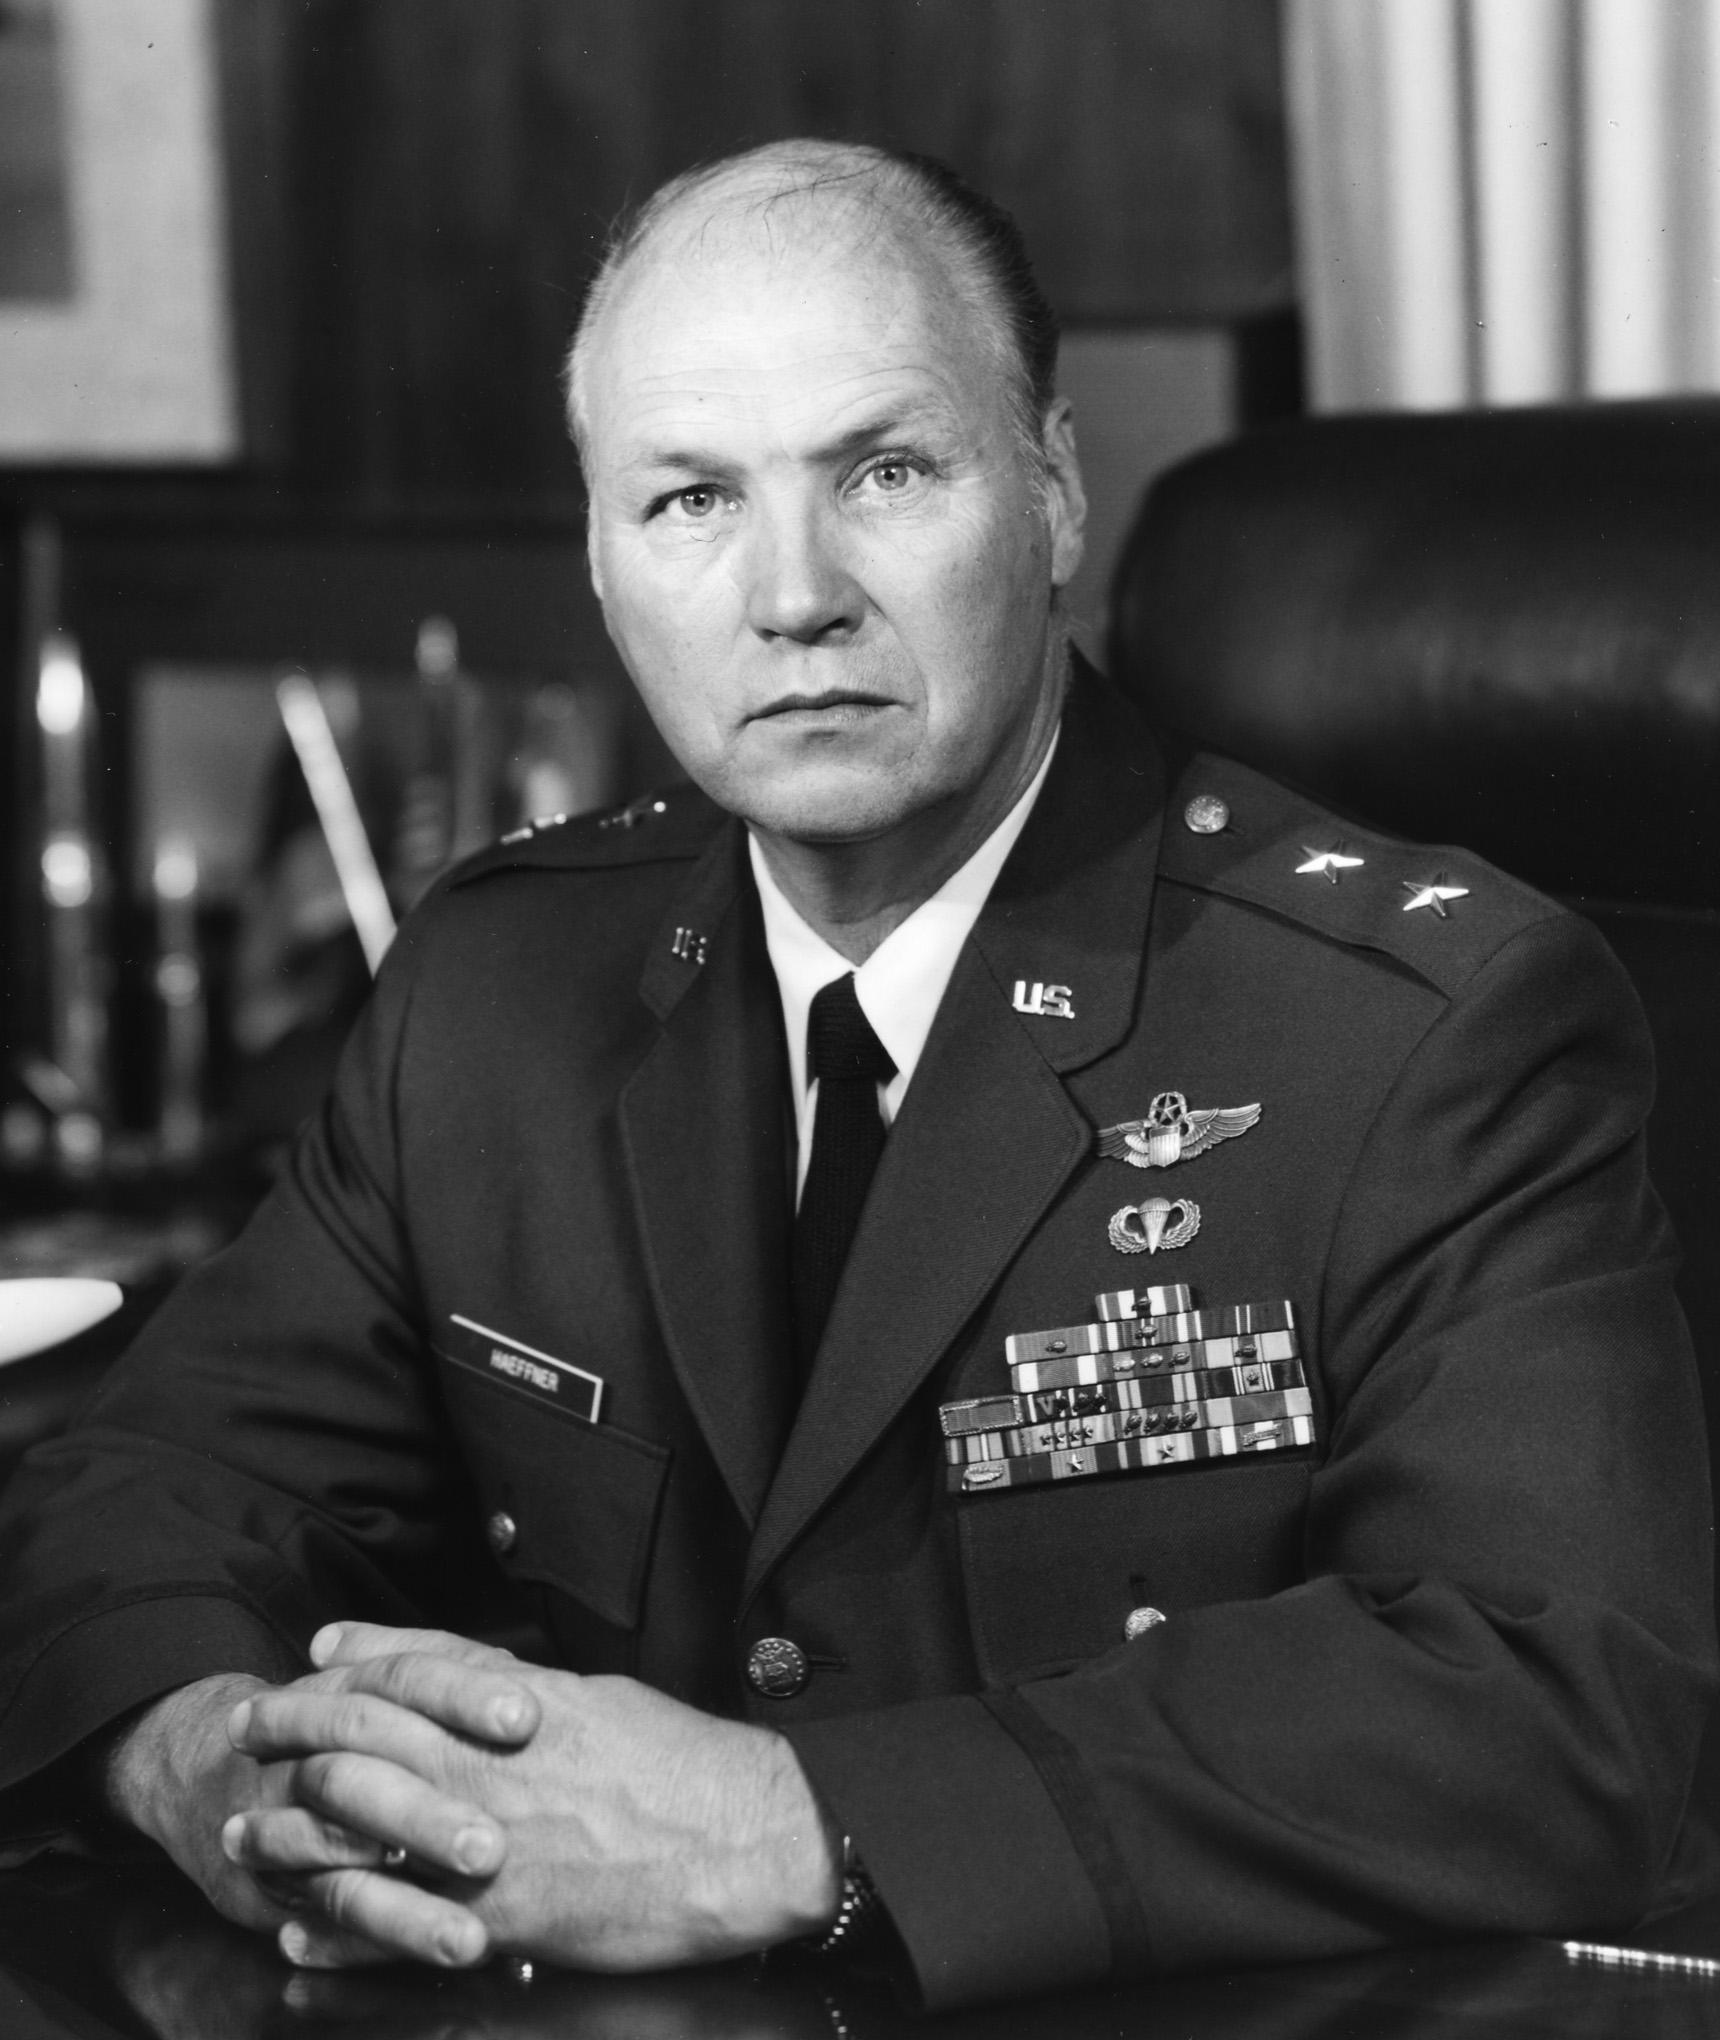 Major General Fred A Haeffner U S Air Force Biography Display